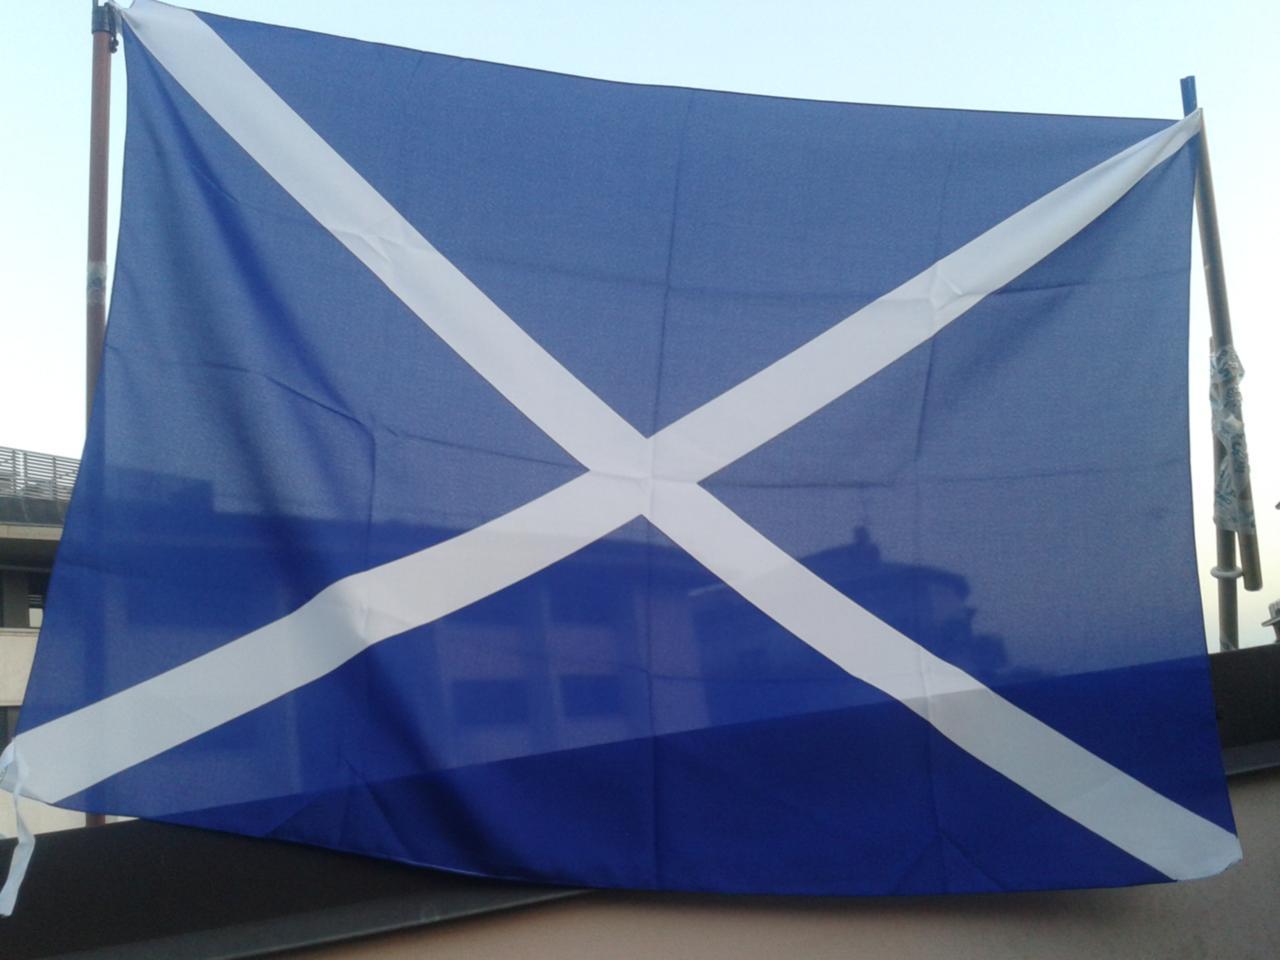 140914 Scozia 19.28.12